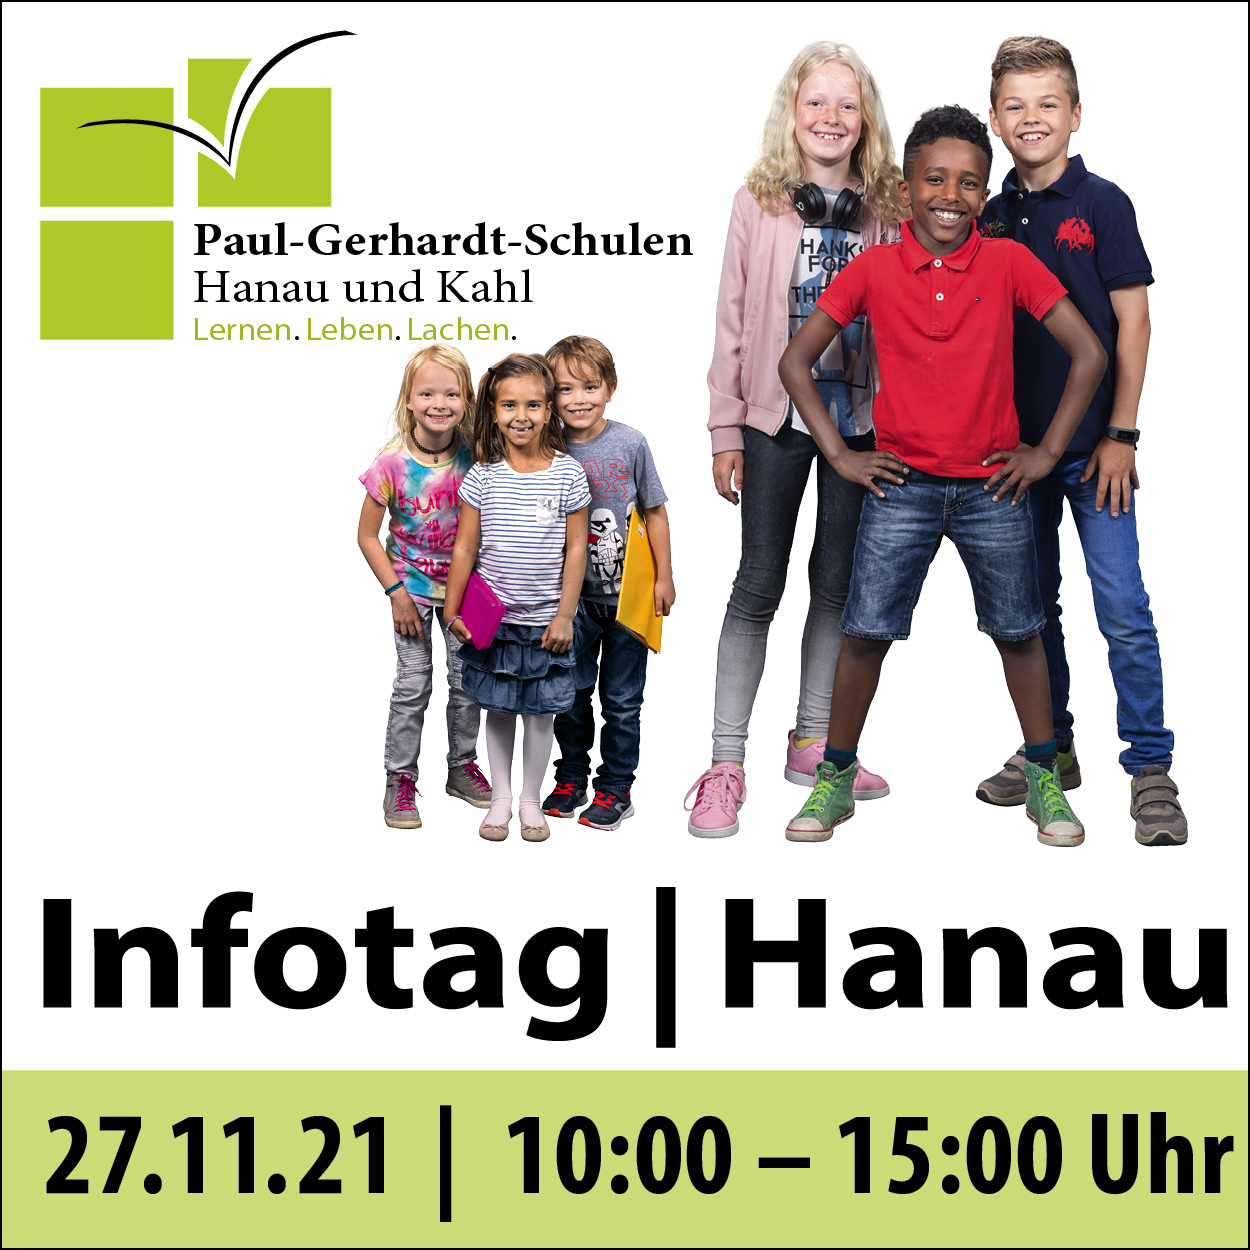 Anzeige der Paul-Gerhardt-Schulen